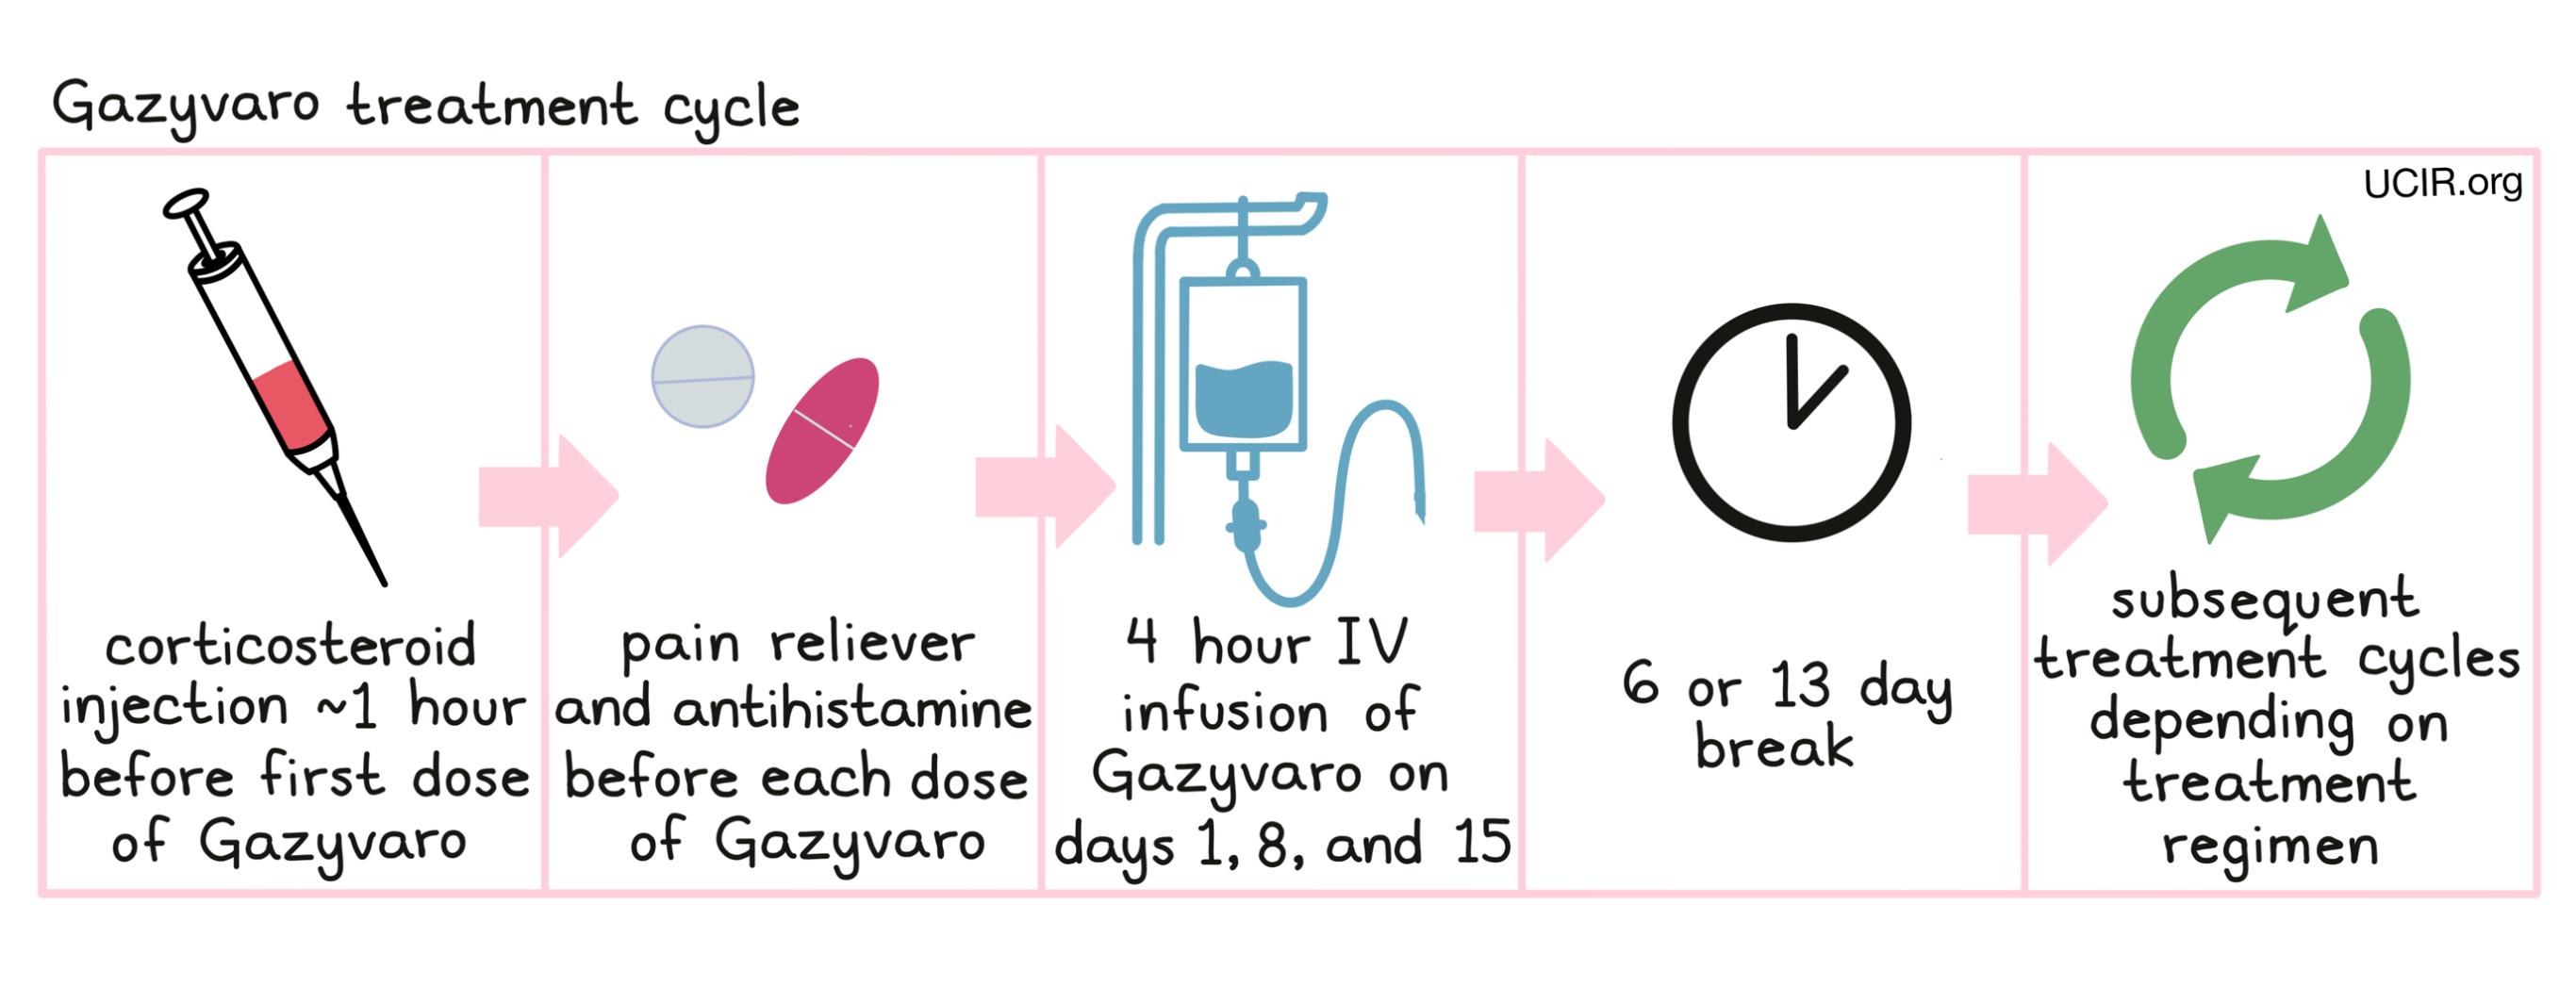 Illustration showing Gazyvaro treatment cycle